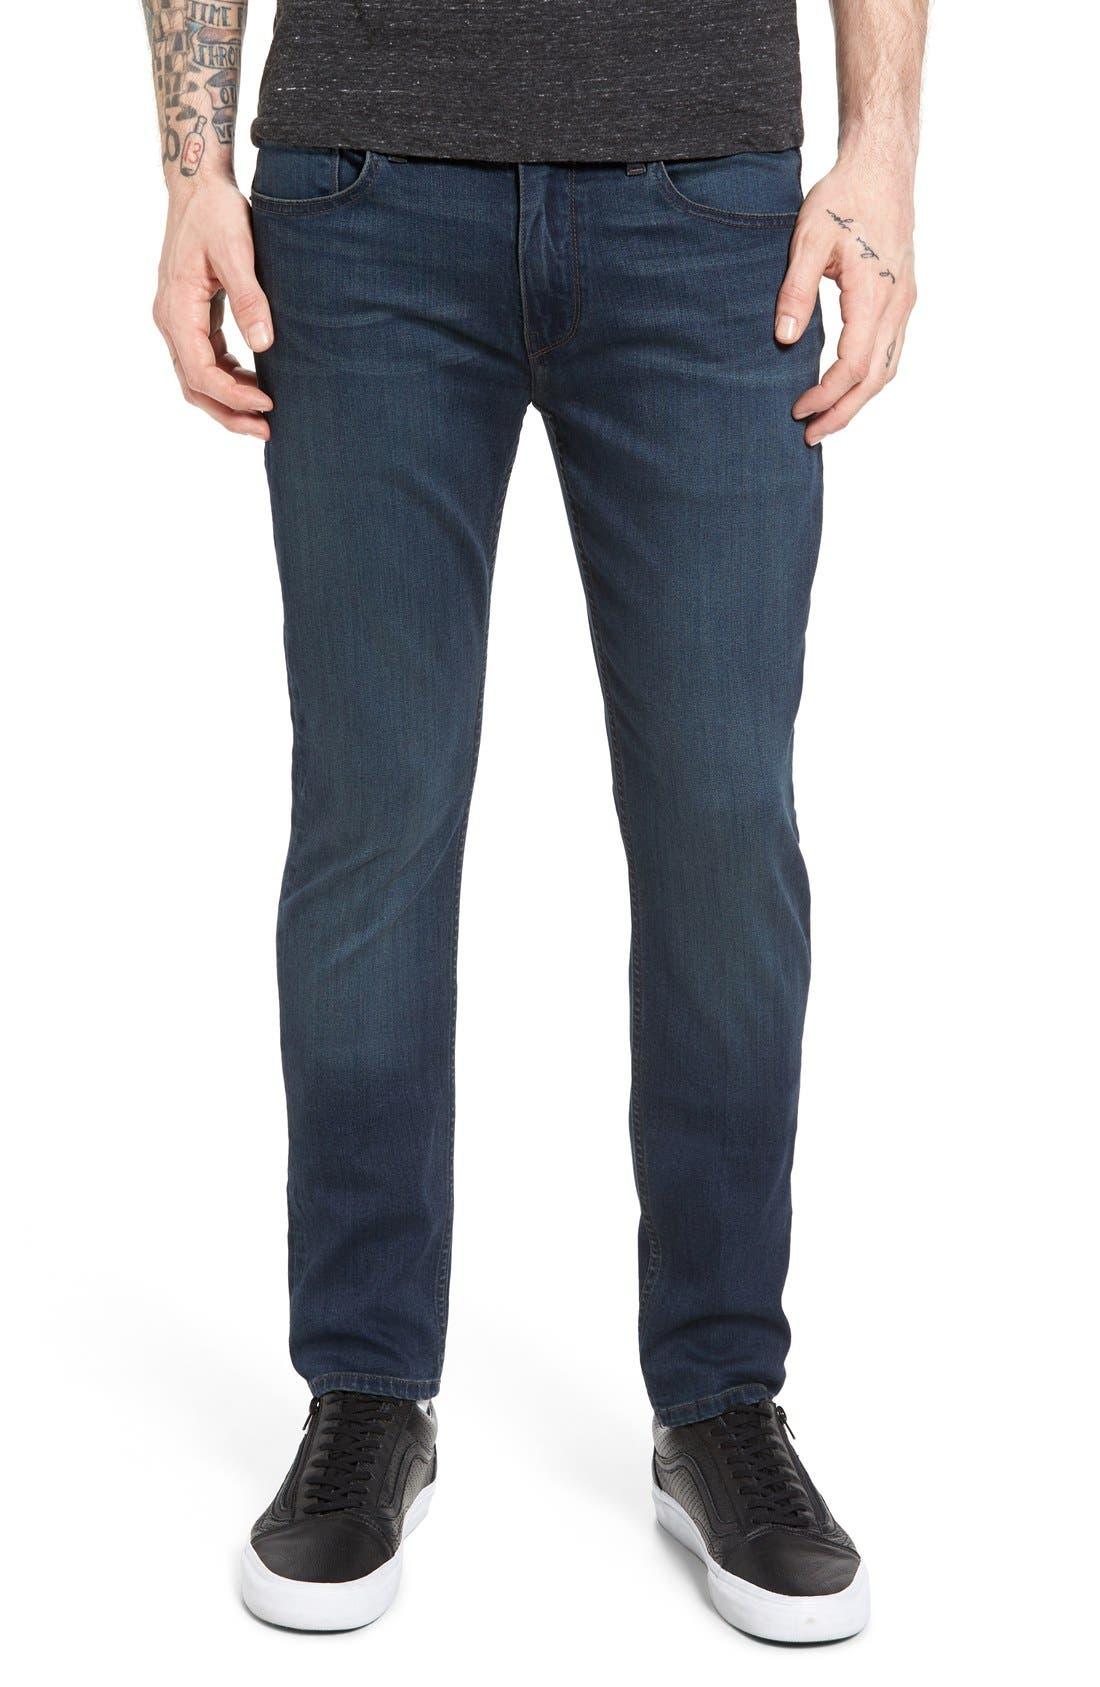 PAIGE Croft Skinny Fit Jeans (Corbin)